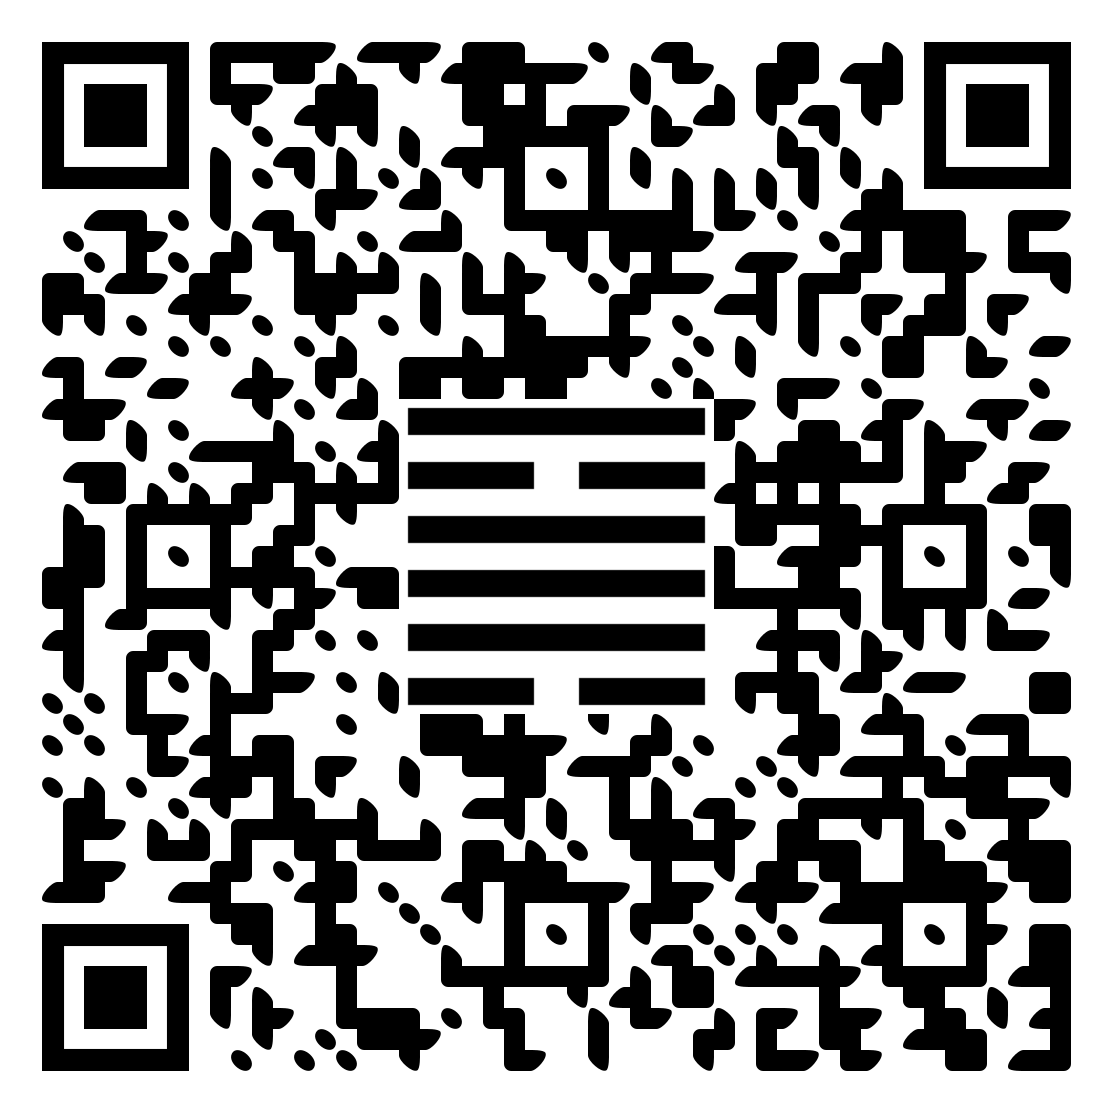 qr-code-50.png